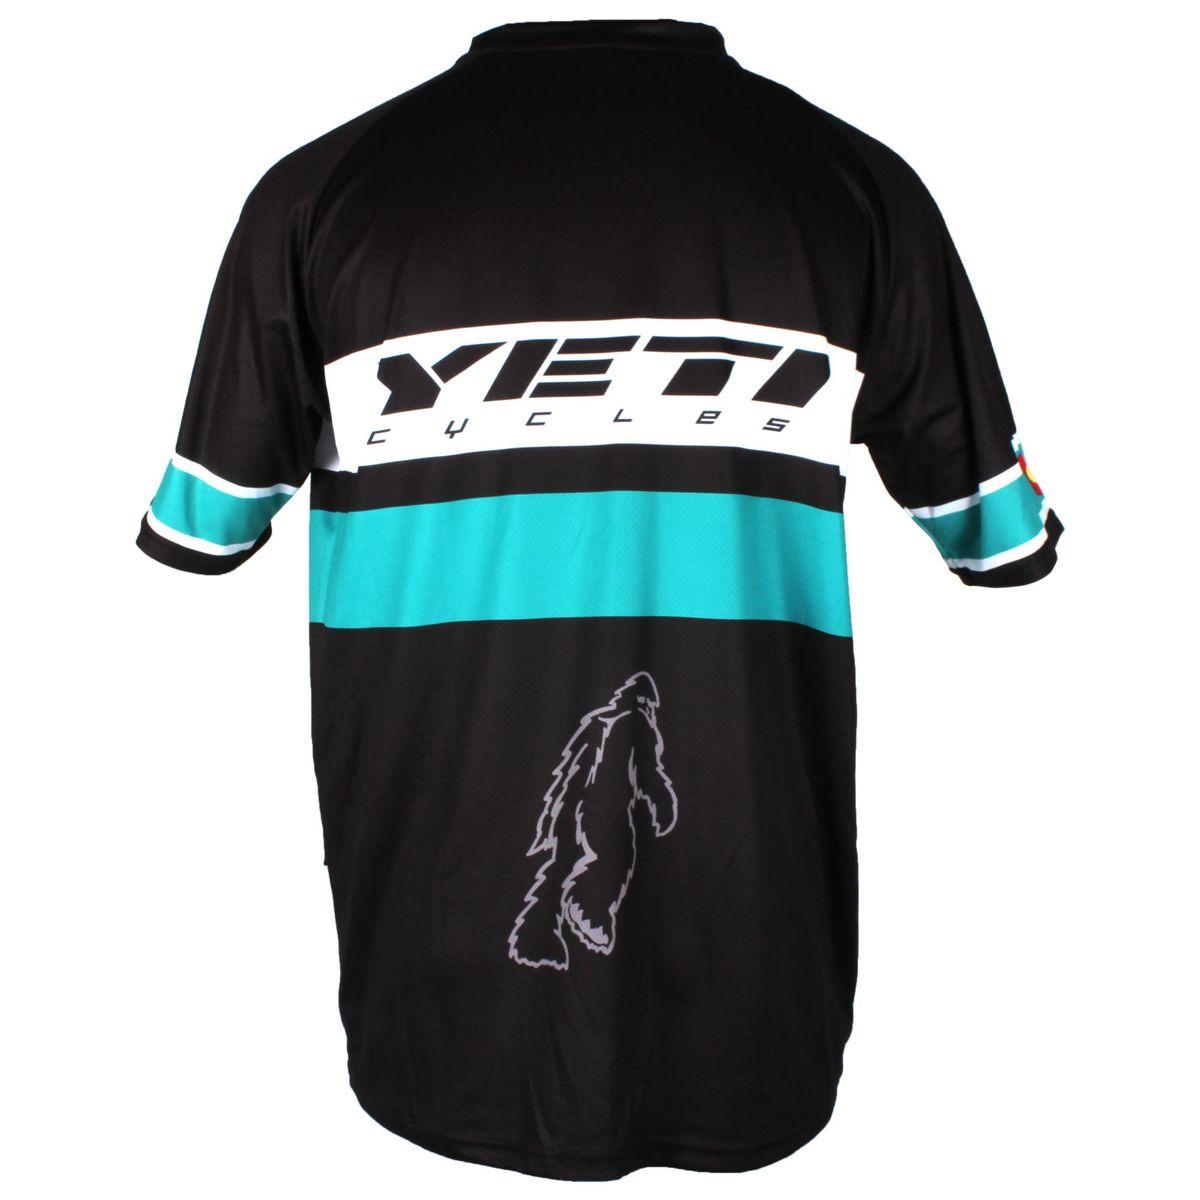 Yeti Dunton Jersey maillot blanco o negro negro negro XS-XXL & gt Go cycle Shop a608af